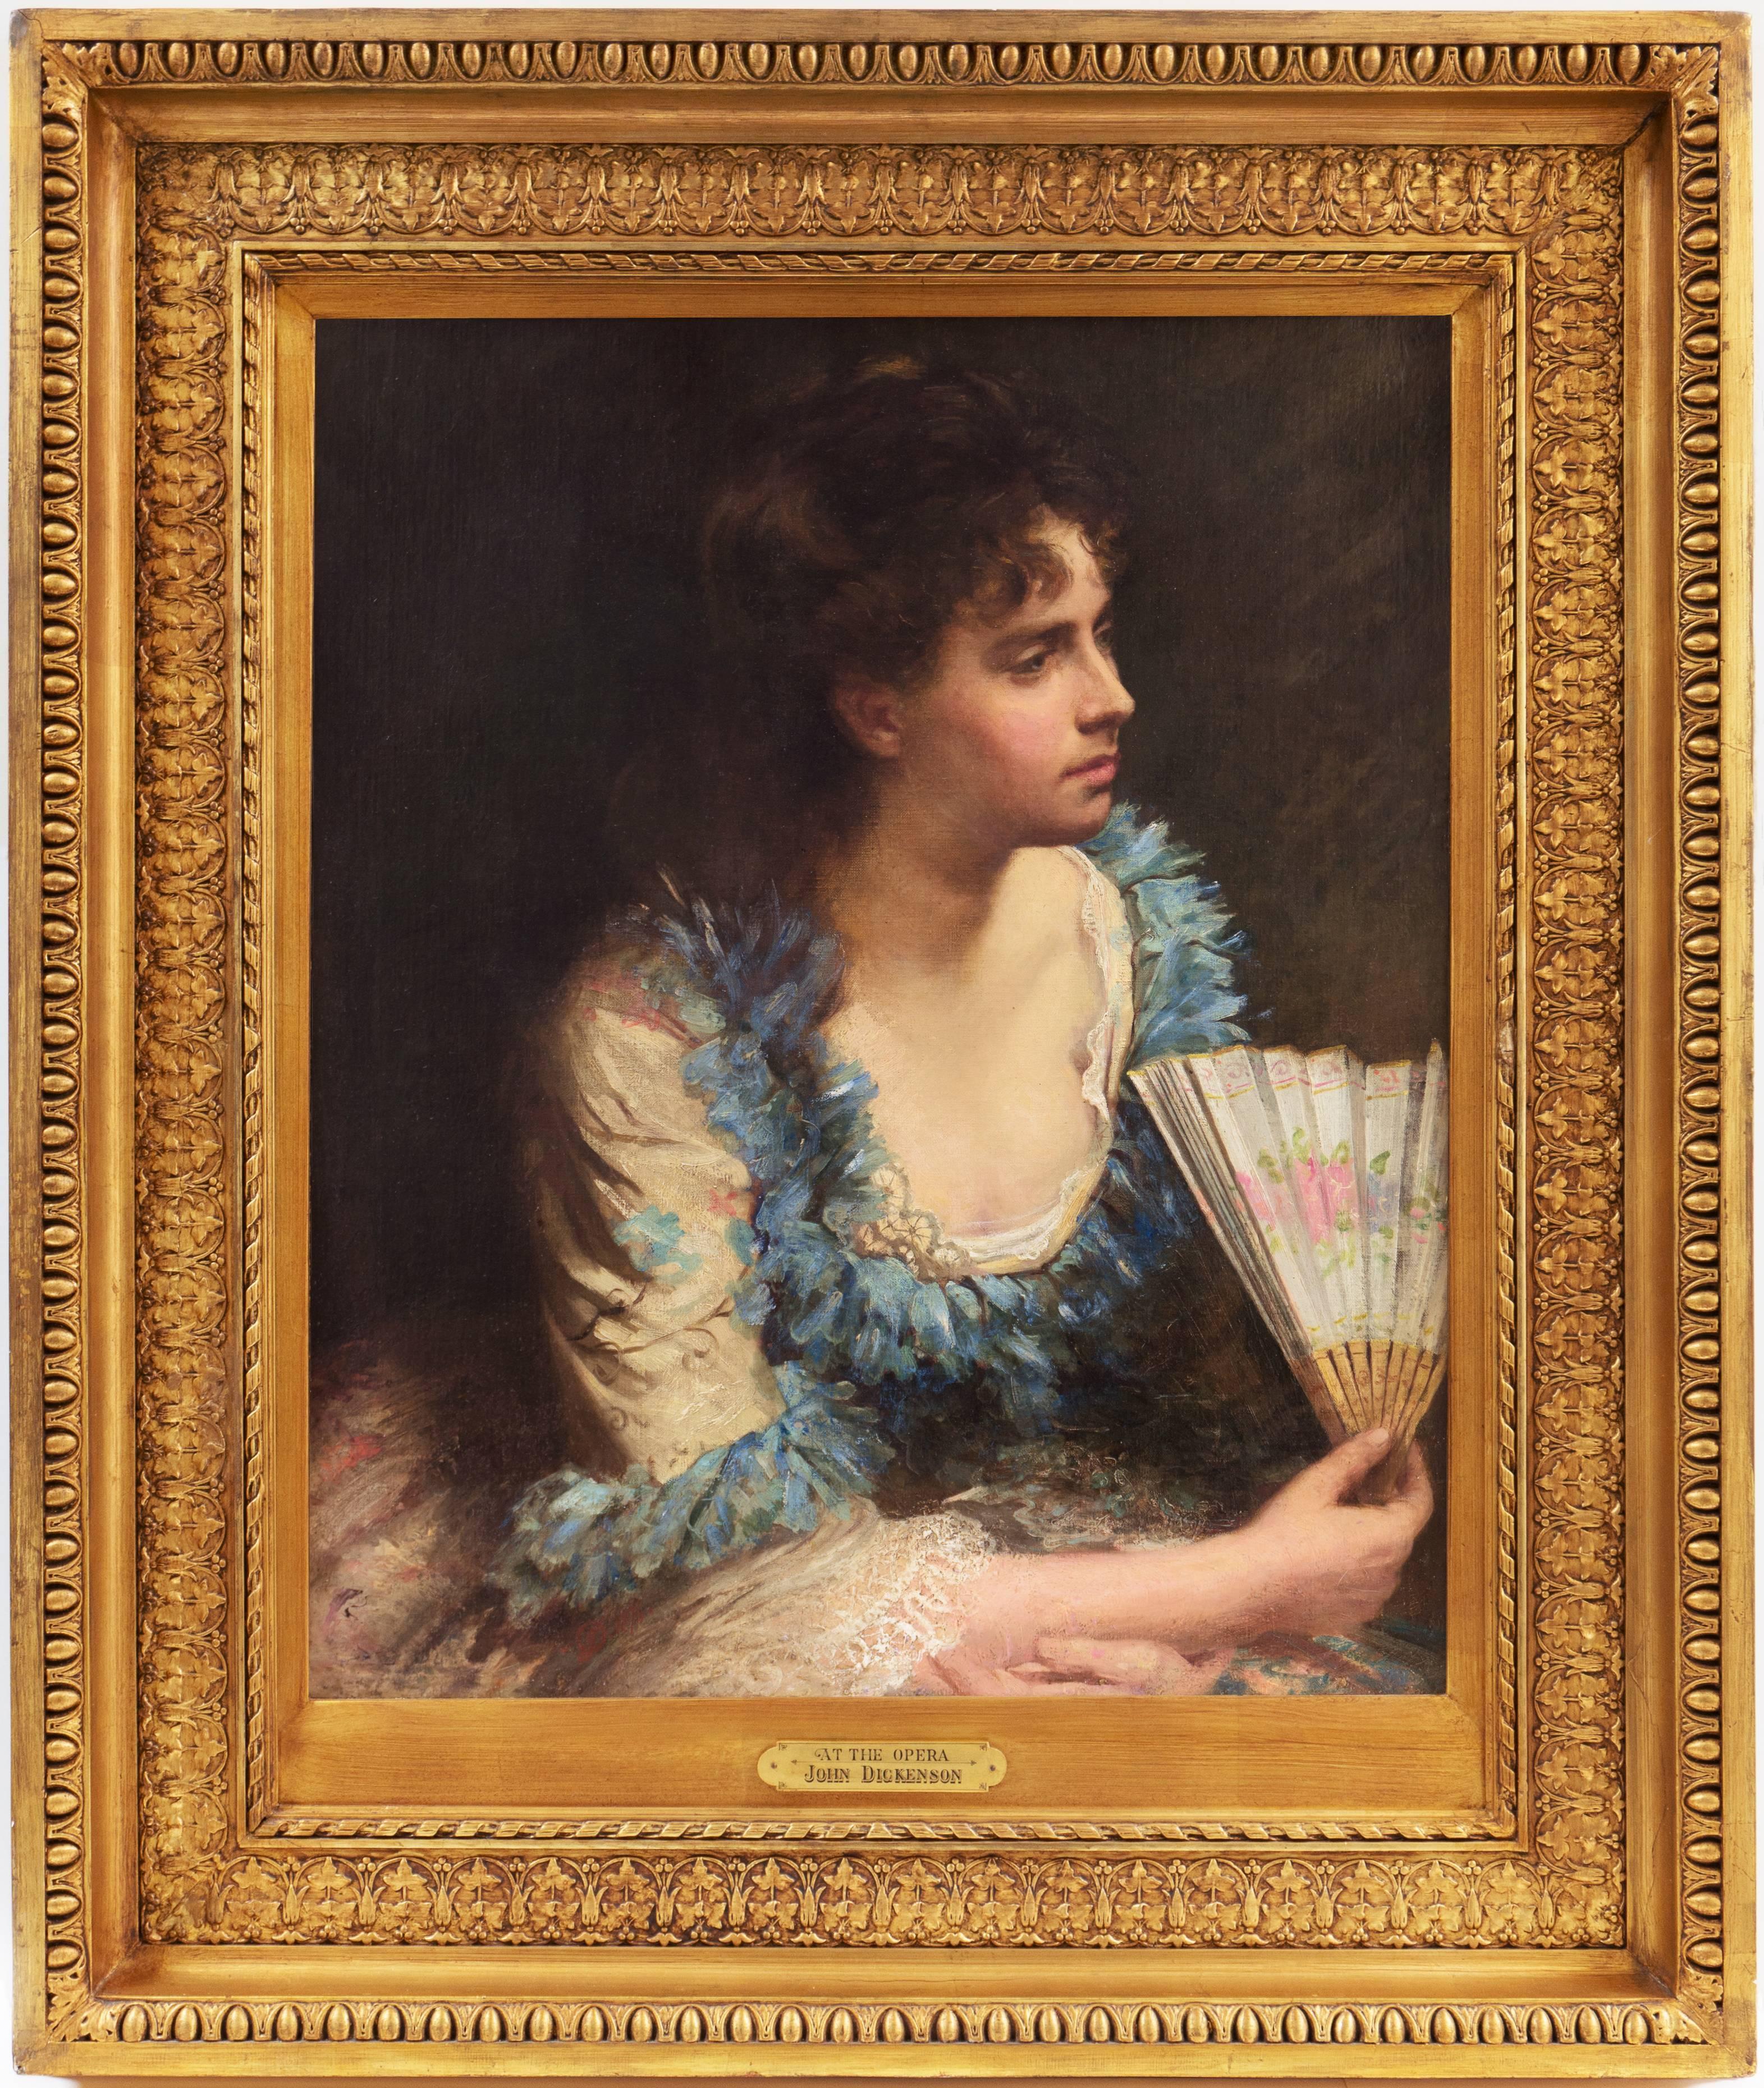 'At the Opera, New York', Beaux Arts Oil, London Royal Academy, Munich, NAD